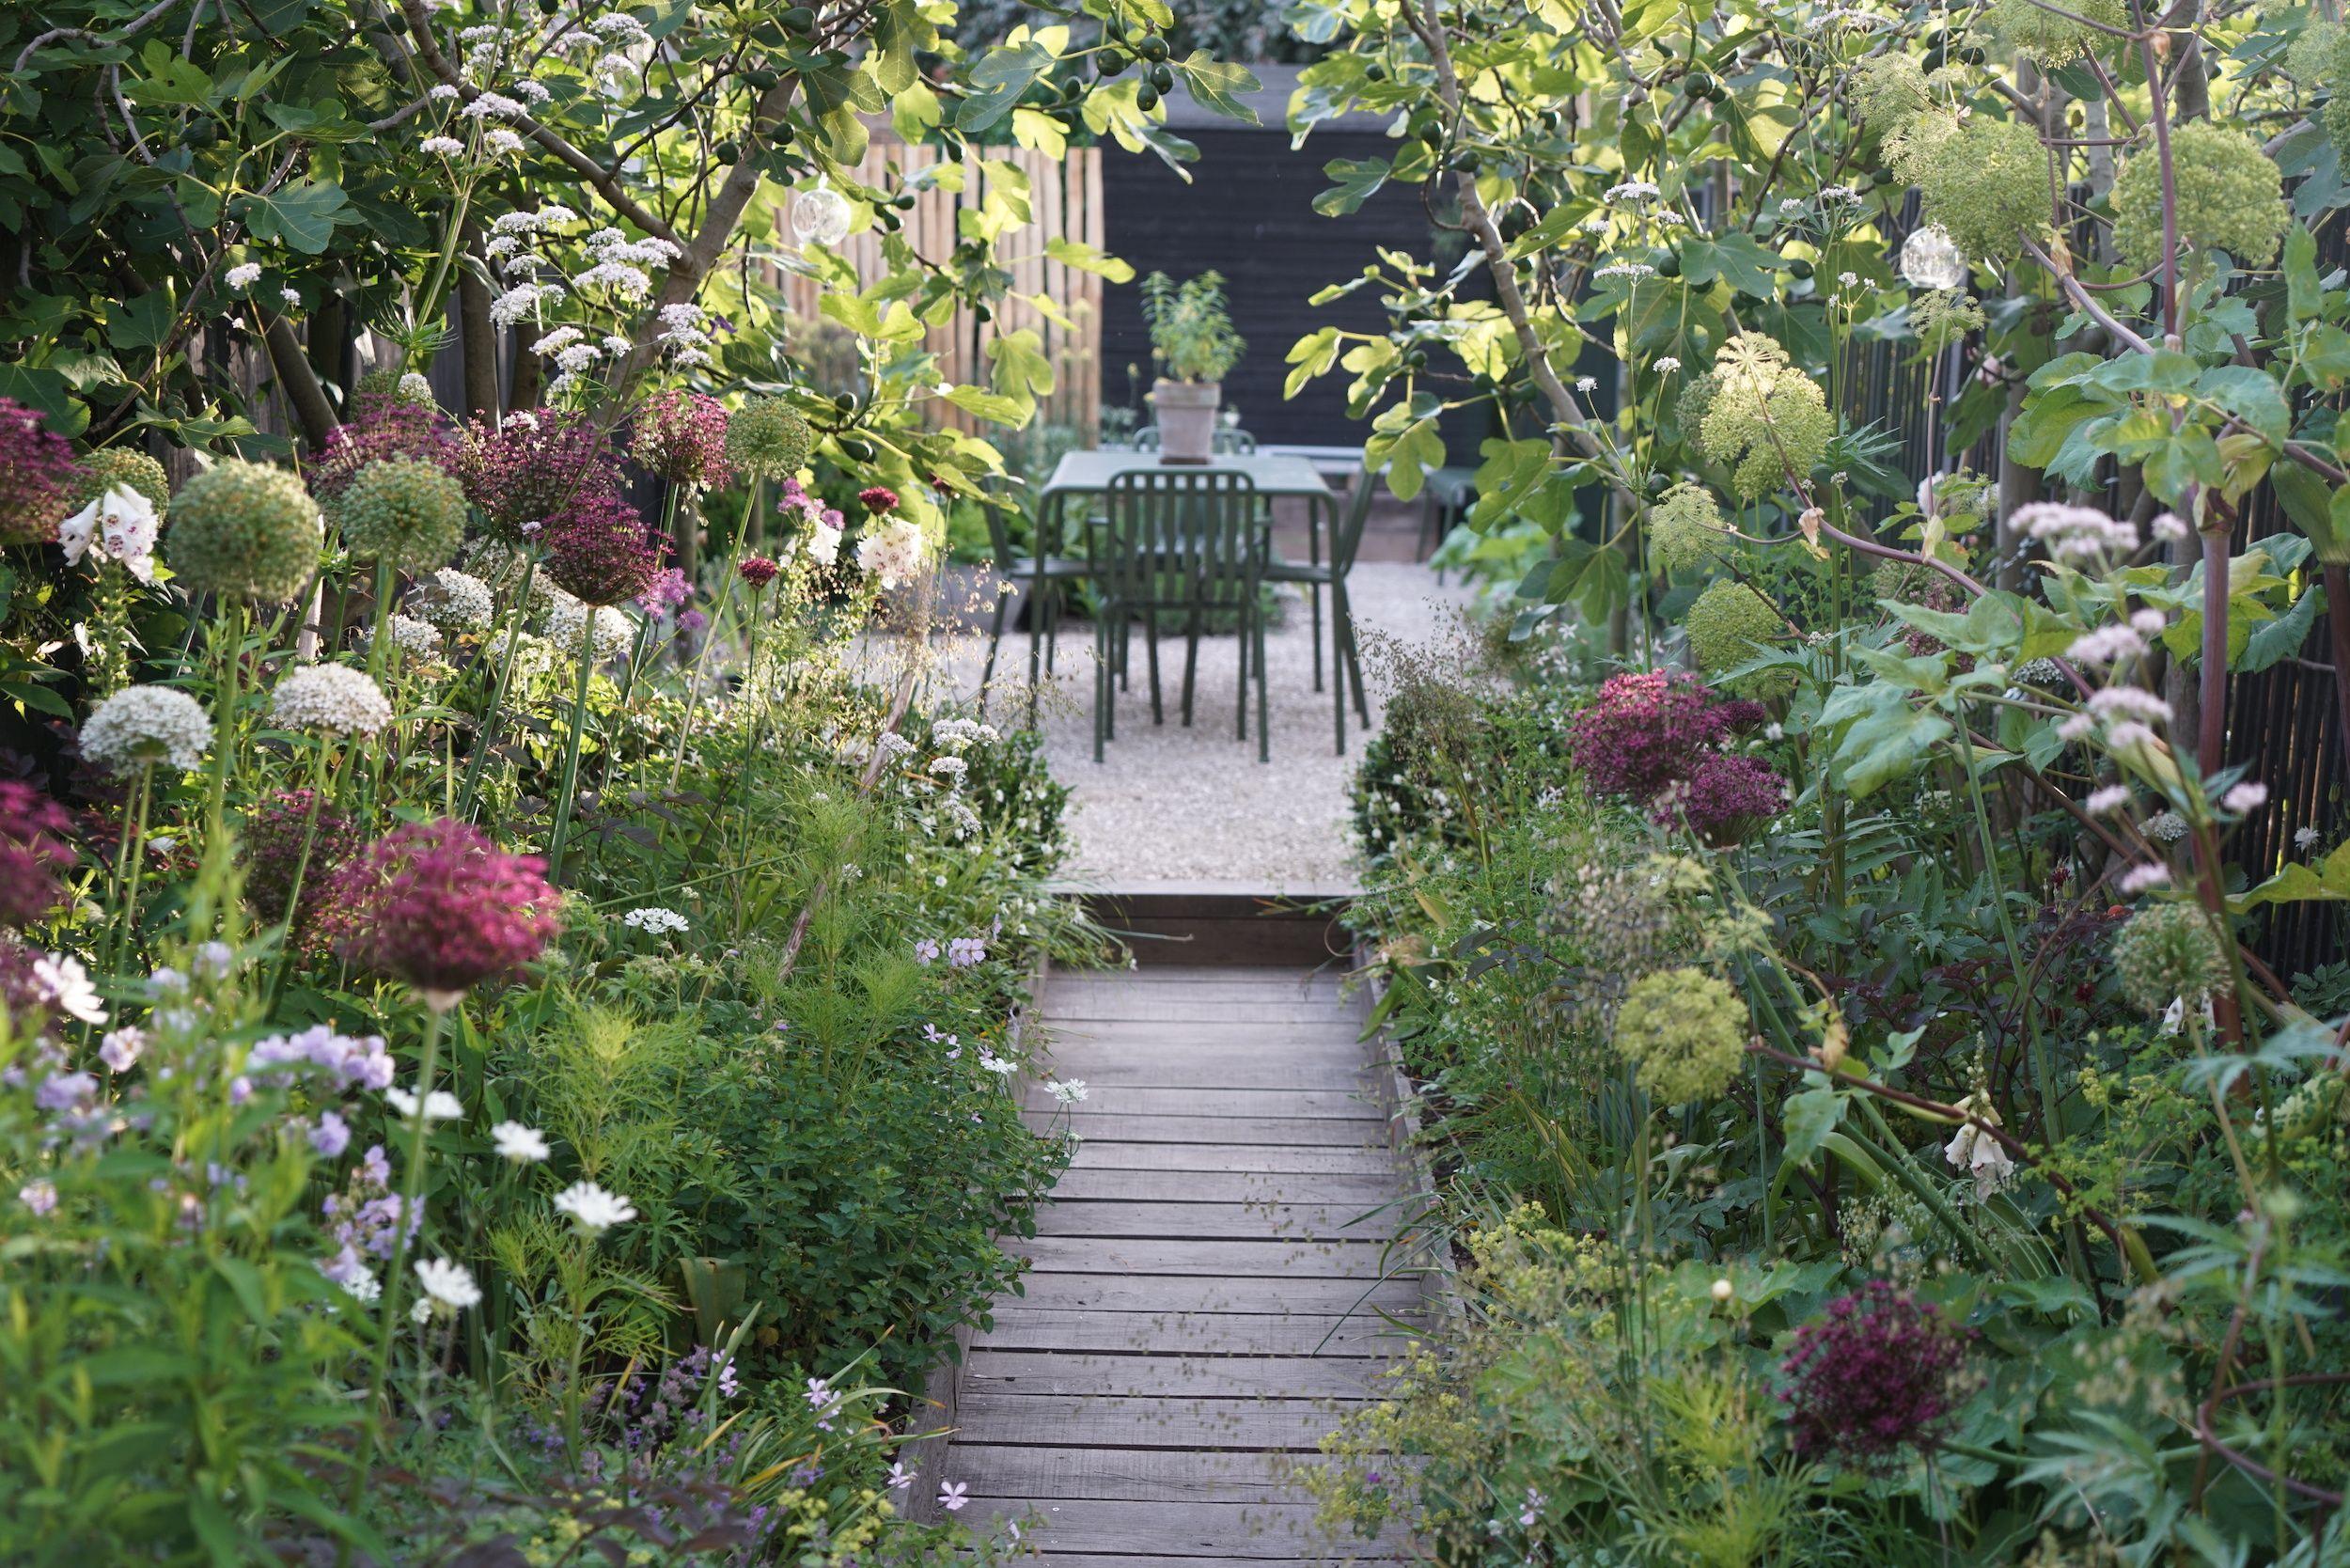 Before & After: A Seaside English Garden by Farlam & Chandler - Gardenista